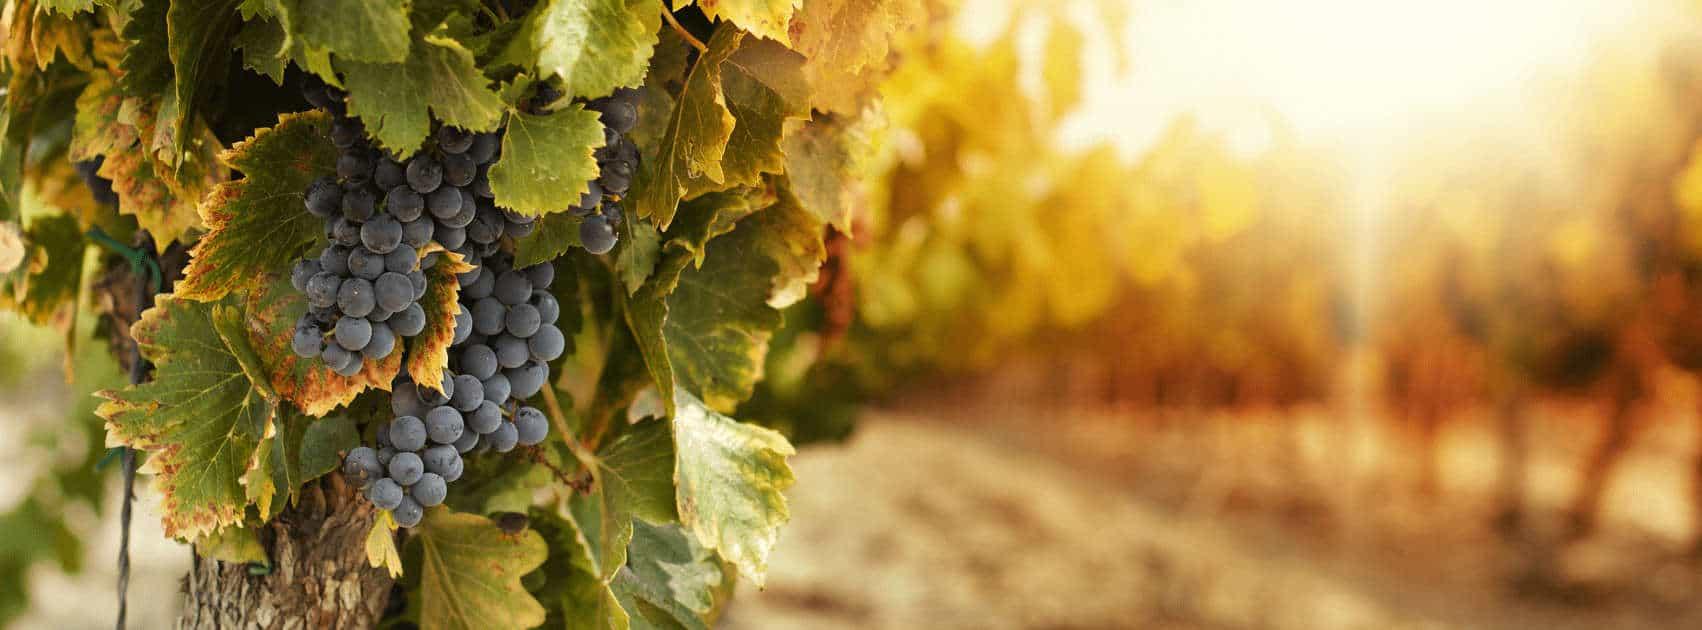 vigne avec raisins